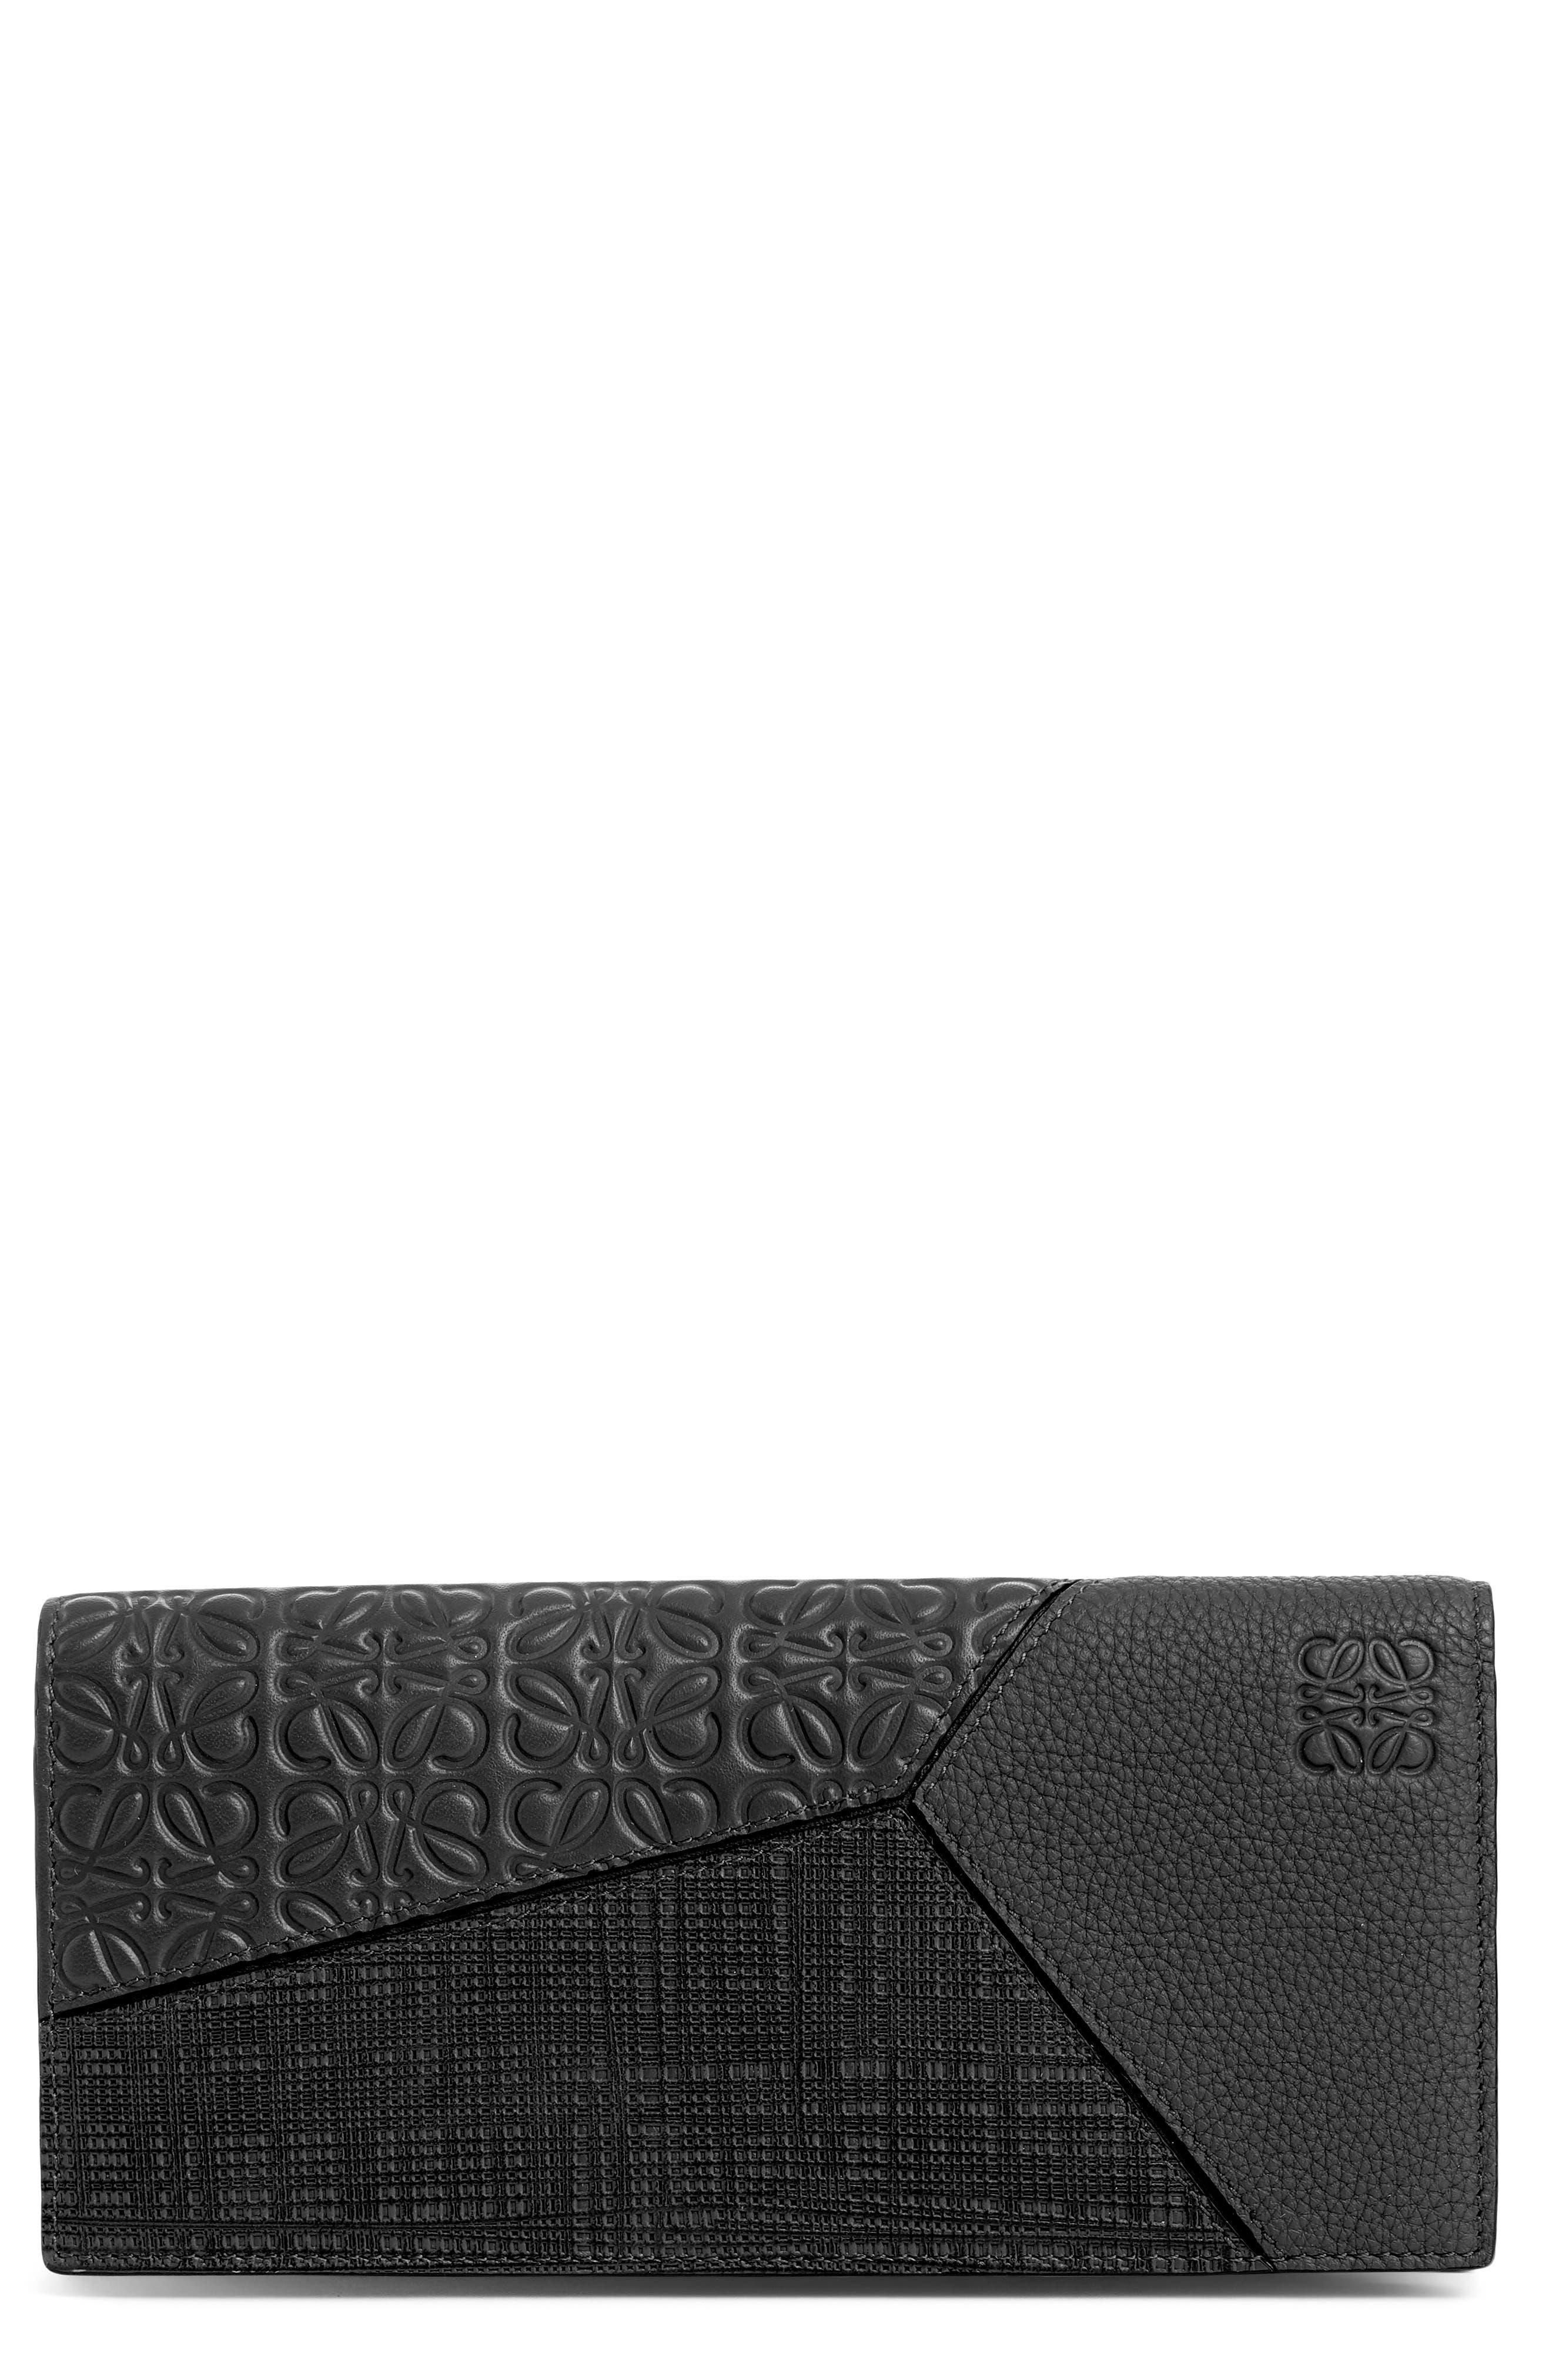 LOEWE, Long Puzzle Bifold Leather Wallet, Main thumbnail 1, color, BLACK